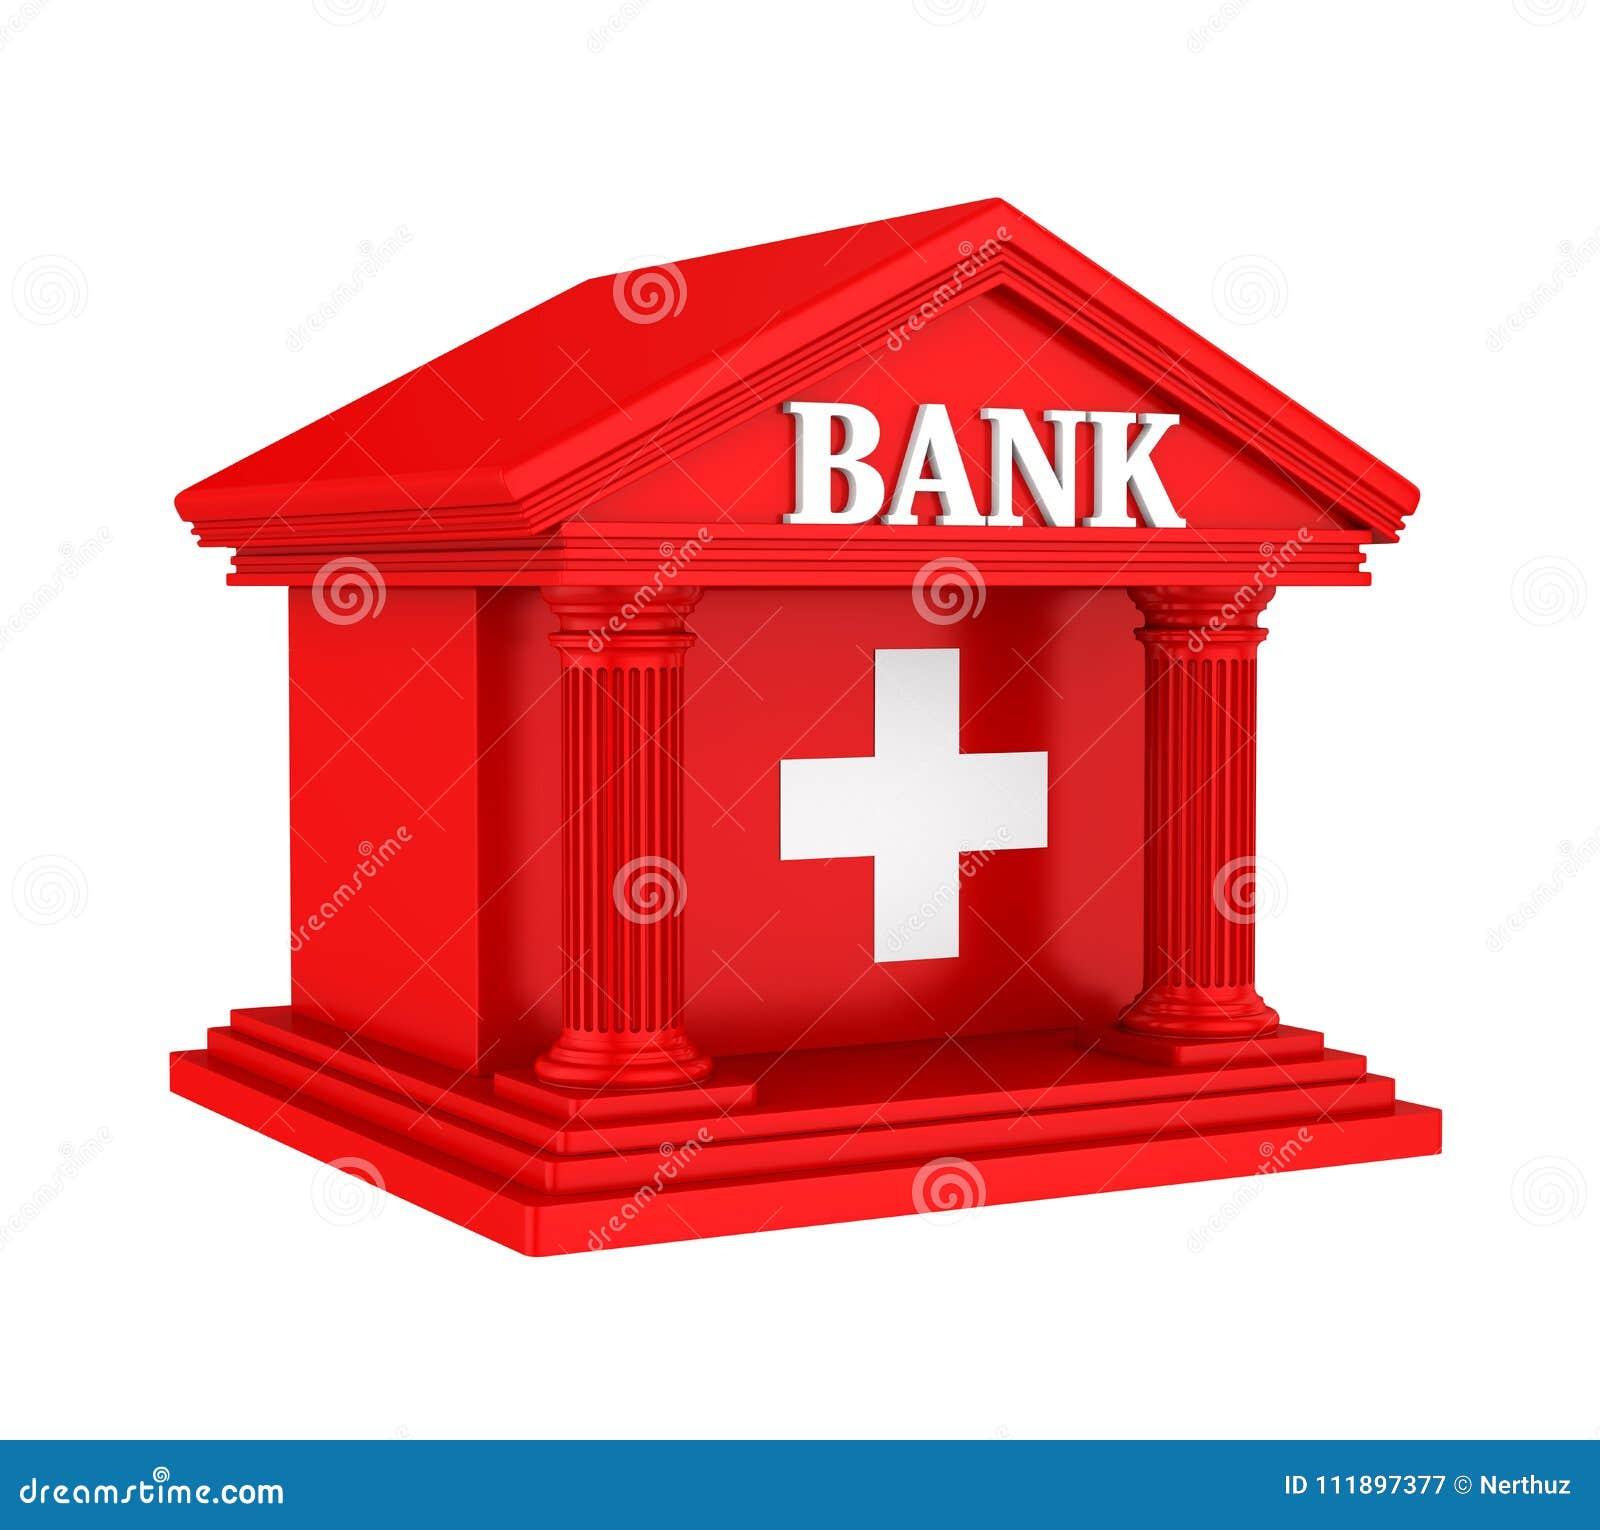 Swiss bank building isolated stock illustration illustration of royalty free stock photo buycottarizona Image collections